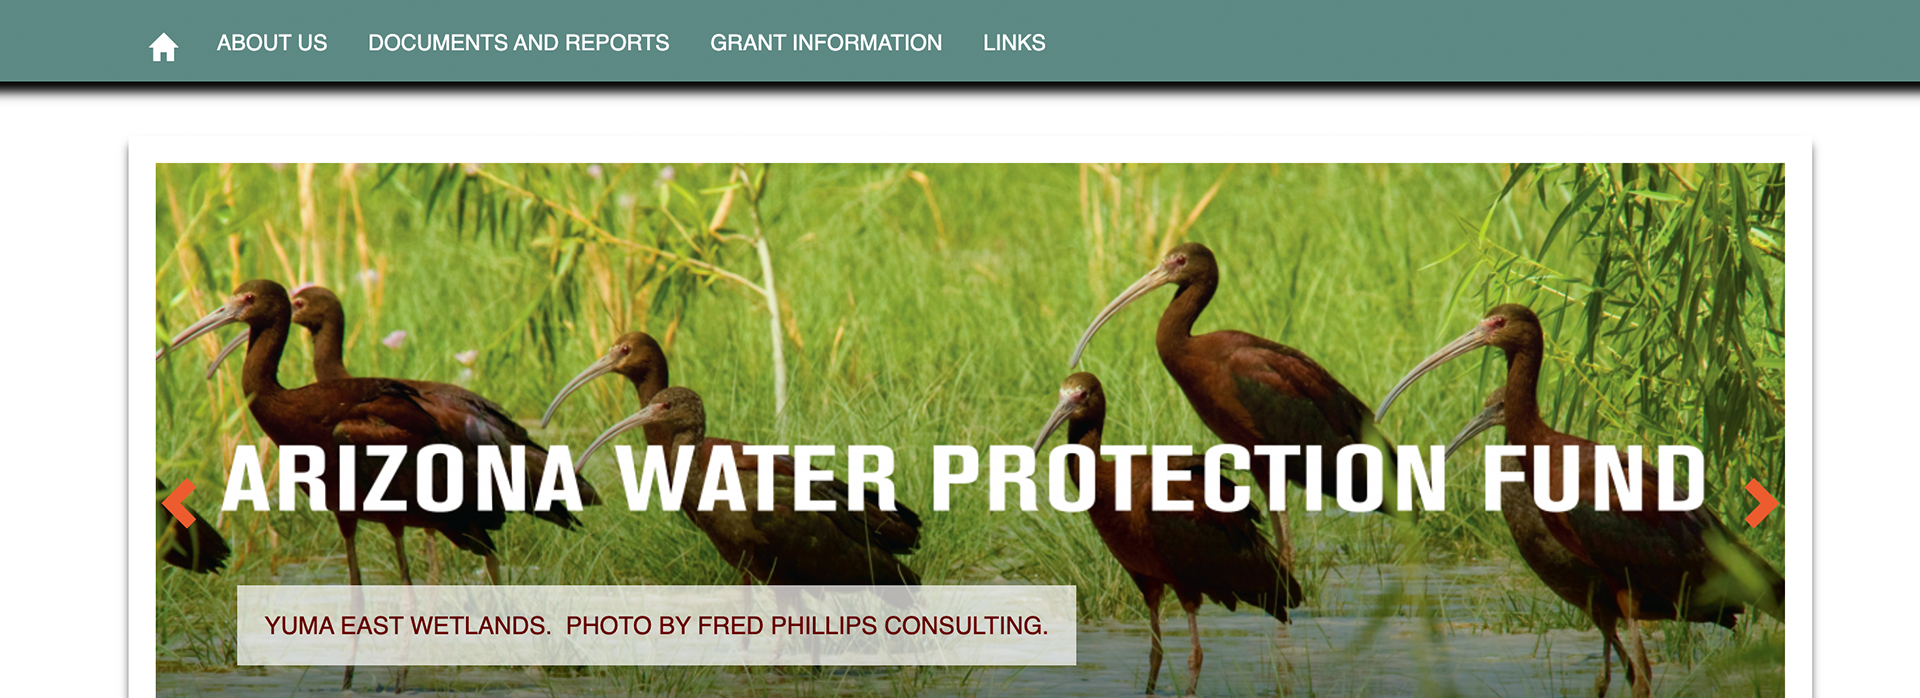 Arizona Water Protection Fund New Website